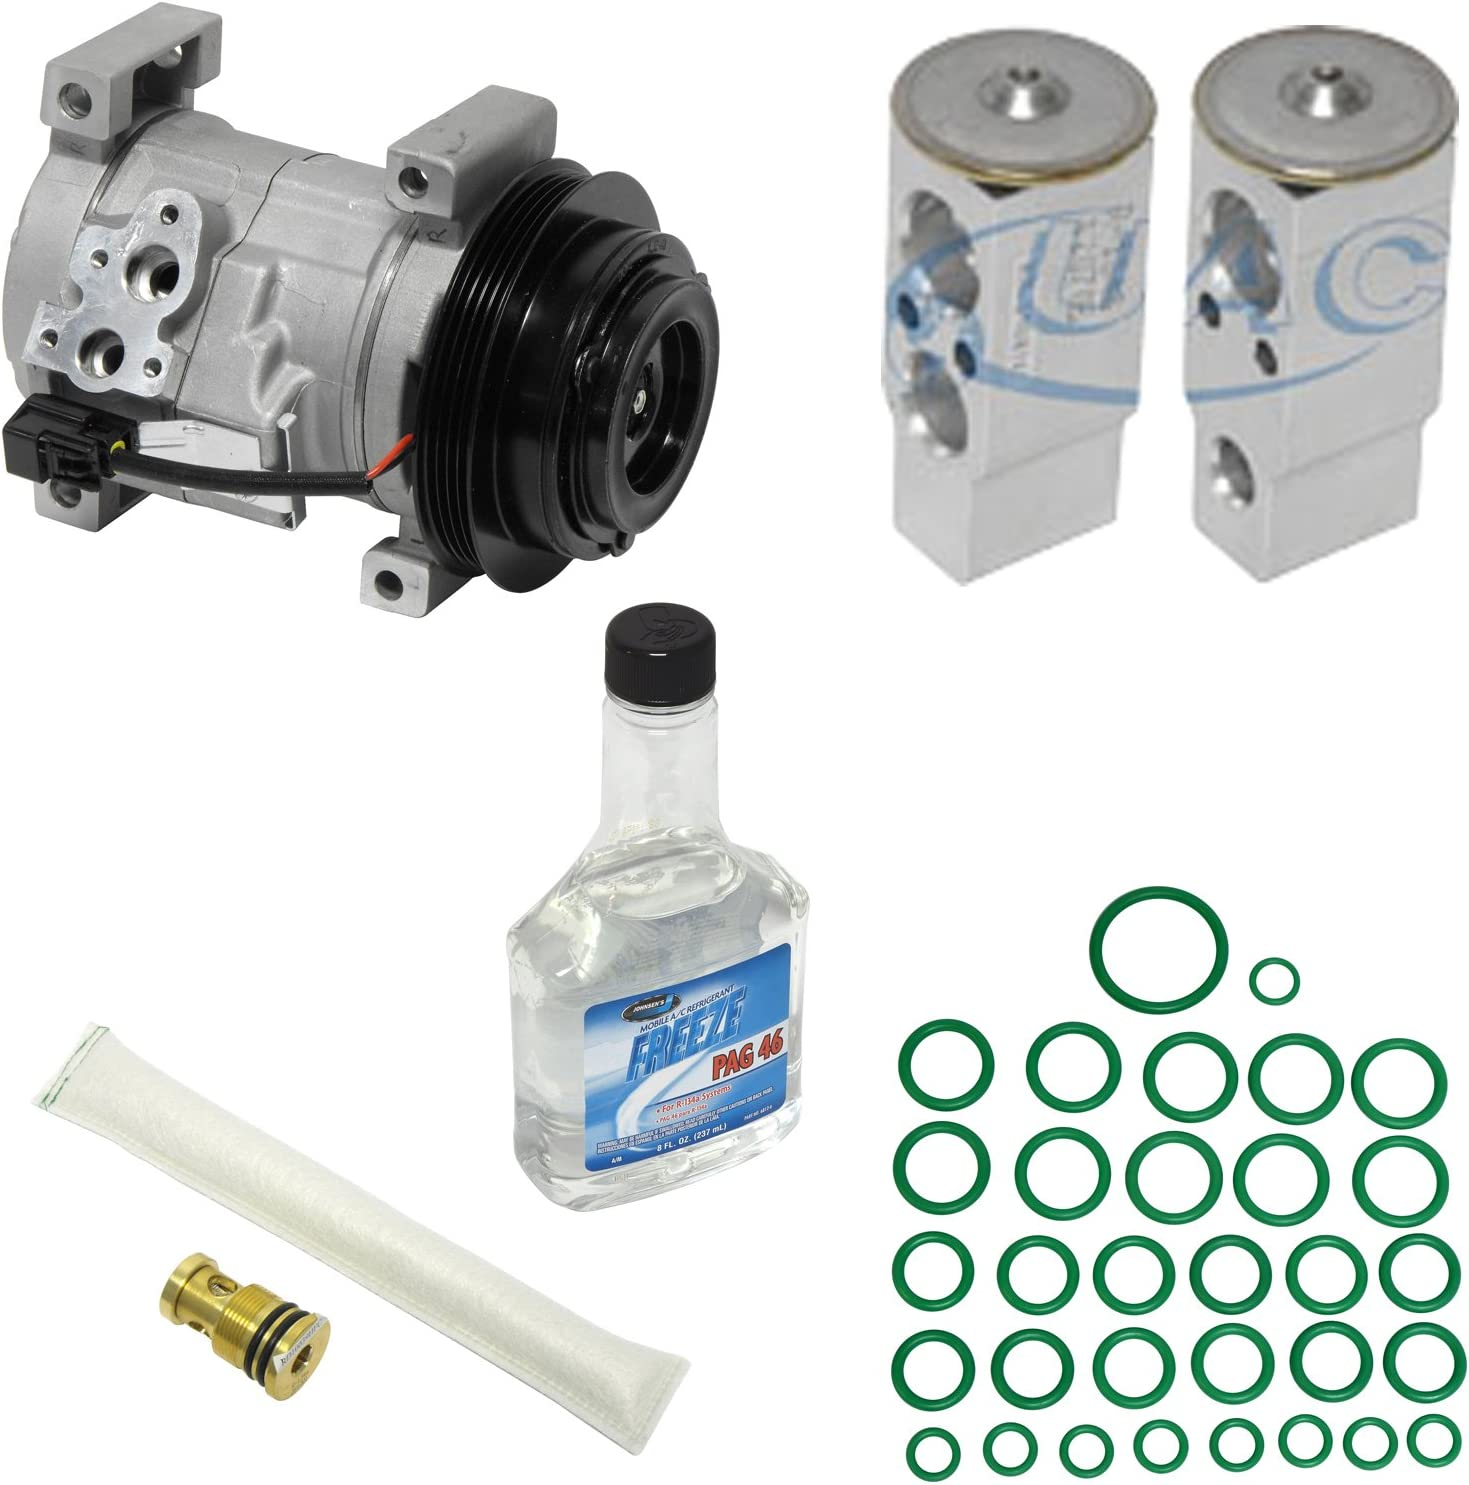 A//C Compressor /& Component Kit-Compressor Replacement Kit UAC KT 3777